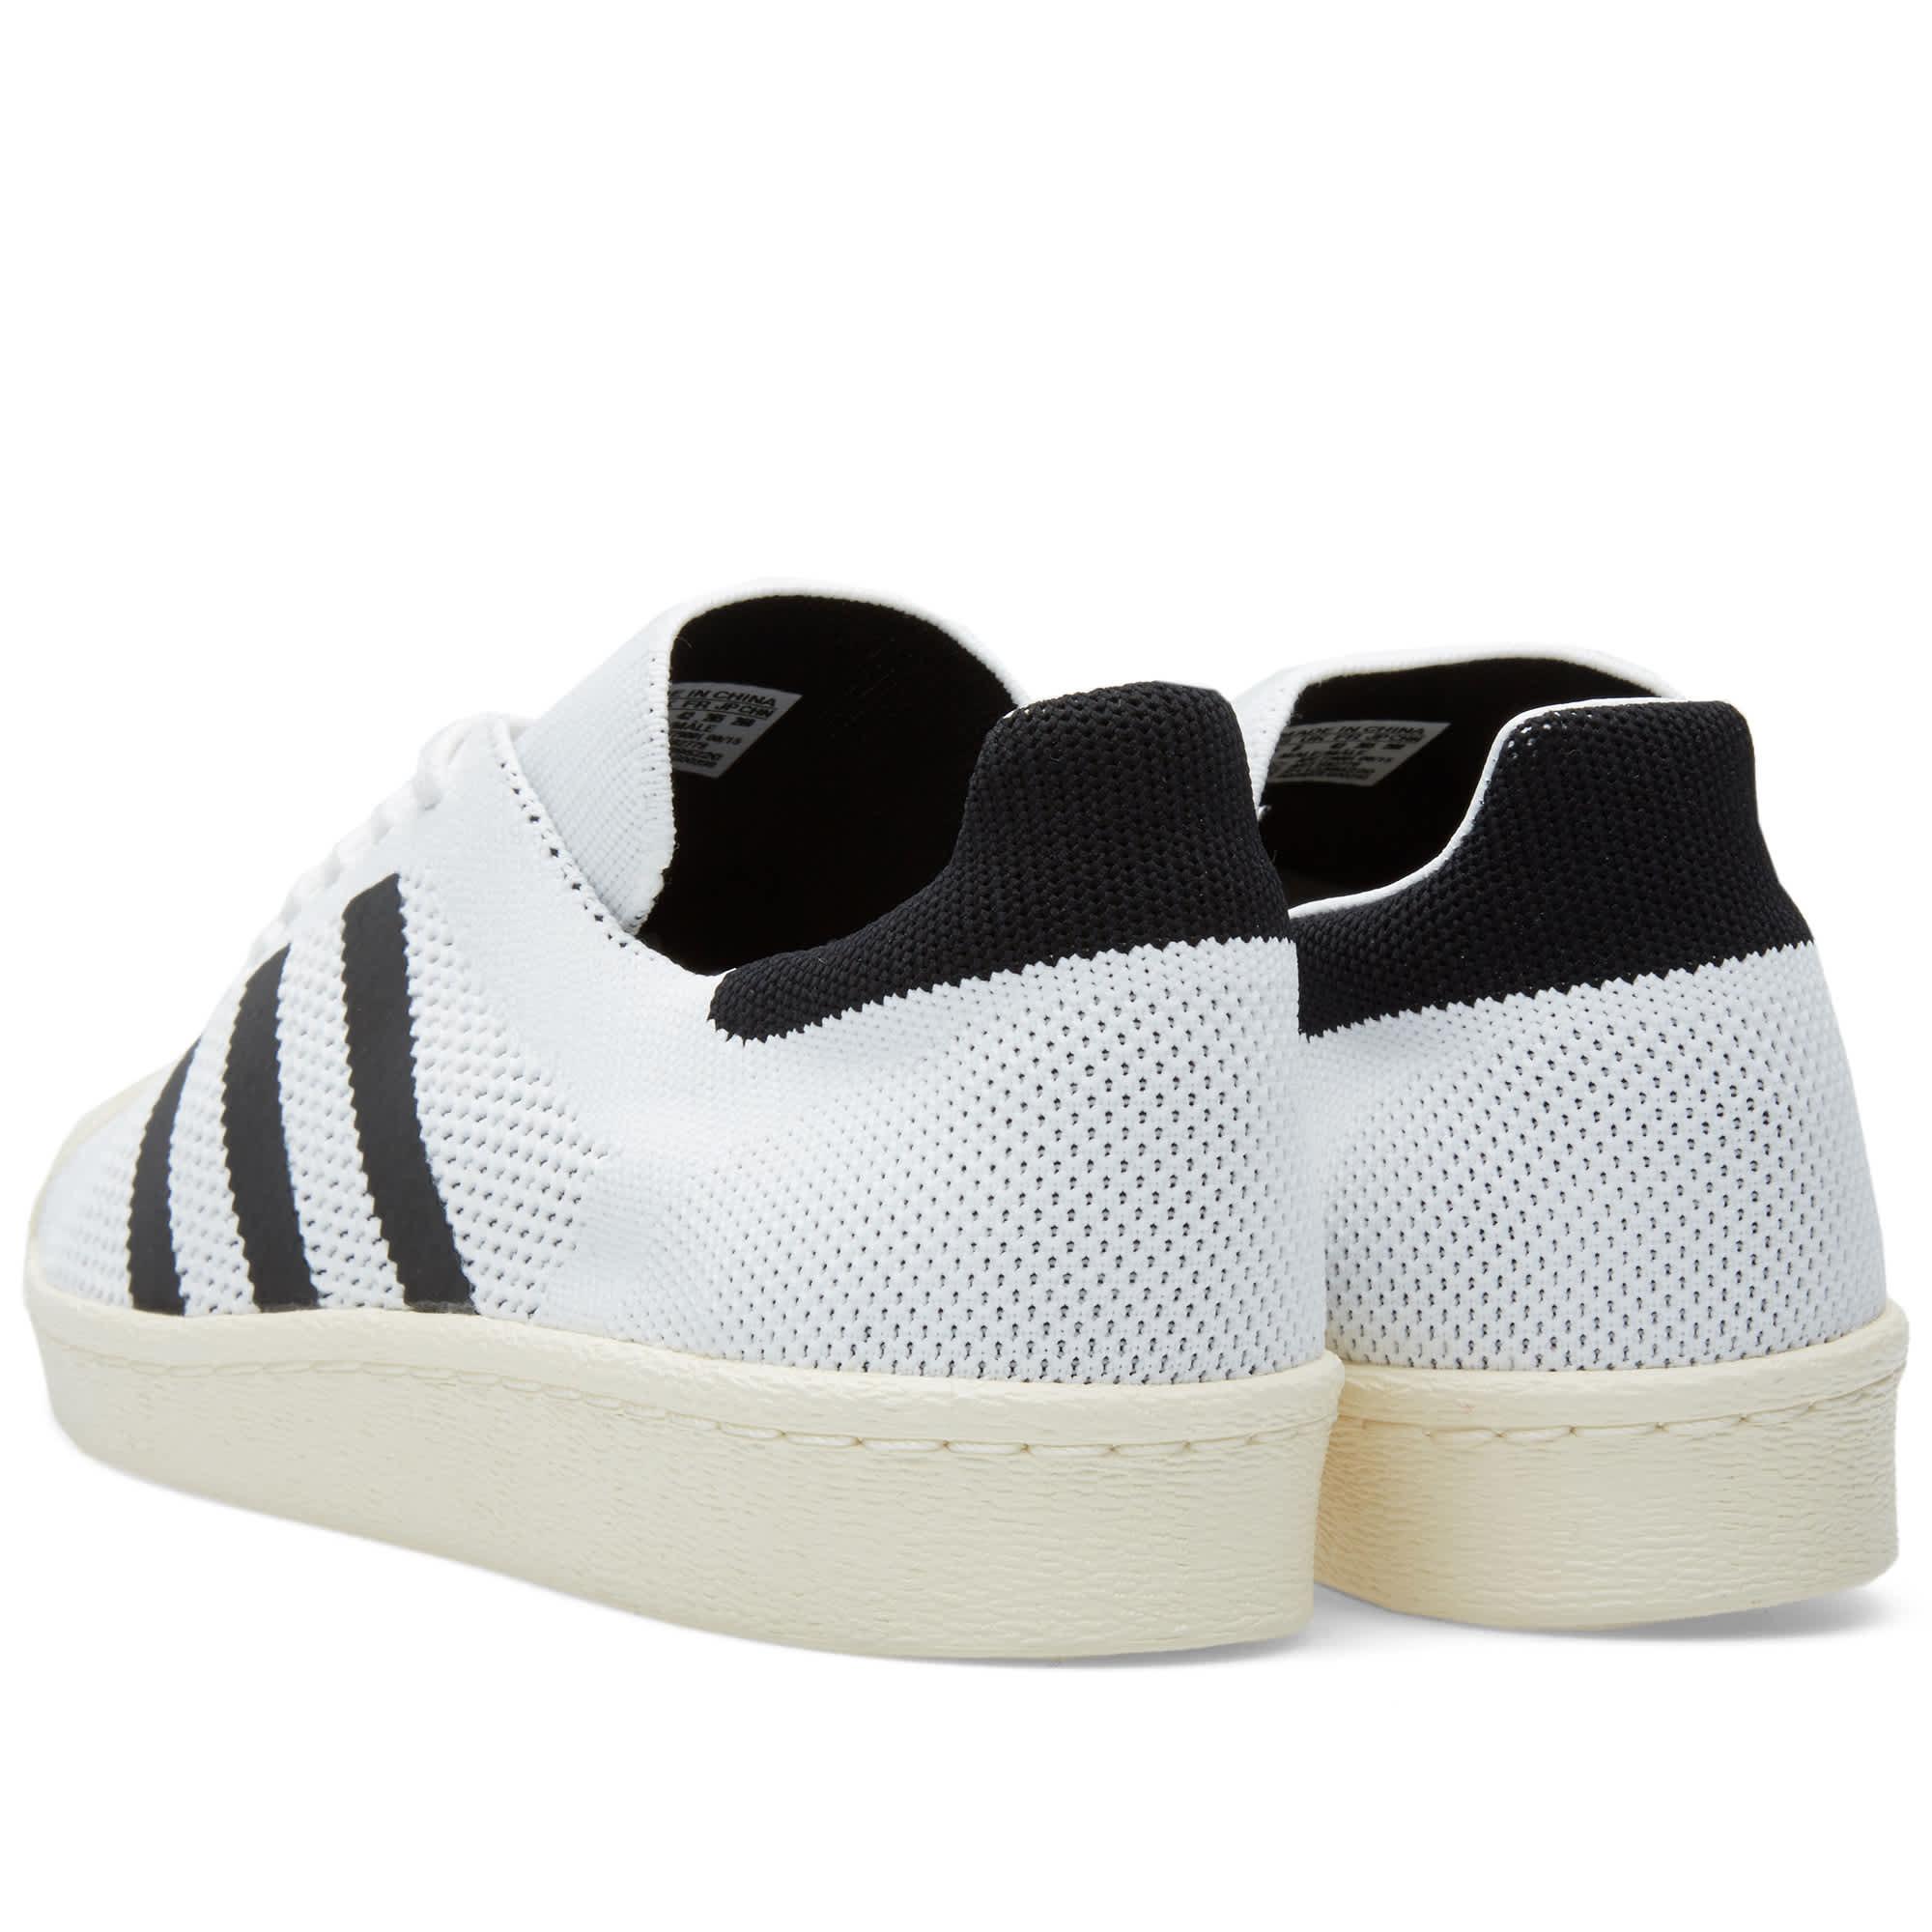 mero Joya Medieval  buy > adidas superstar 80s primeknit white, Up to 60% OFF